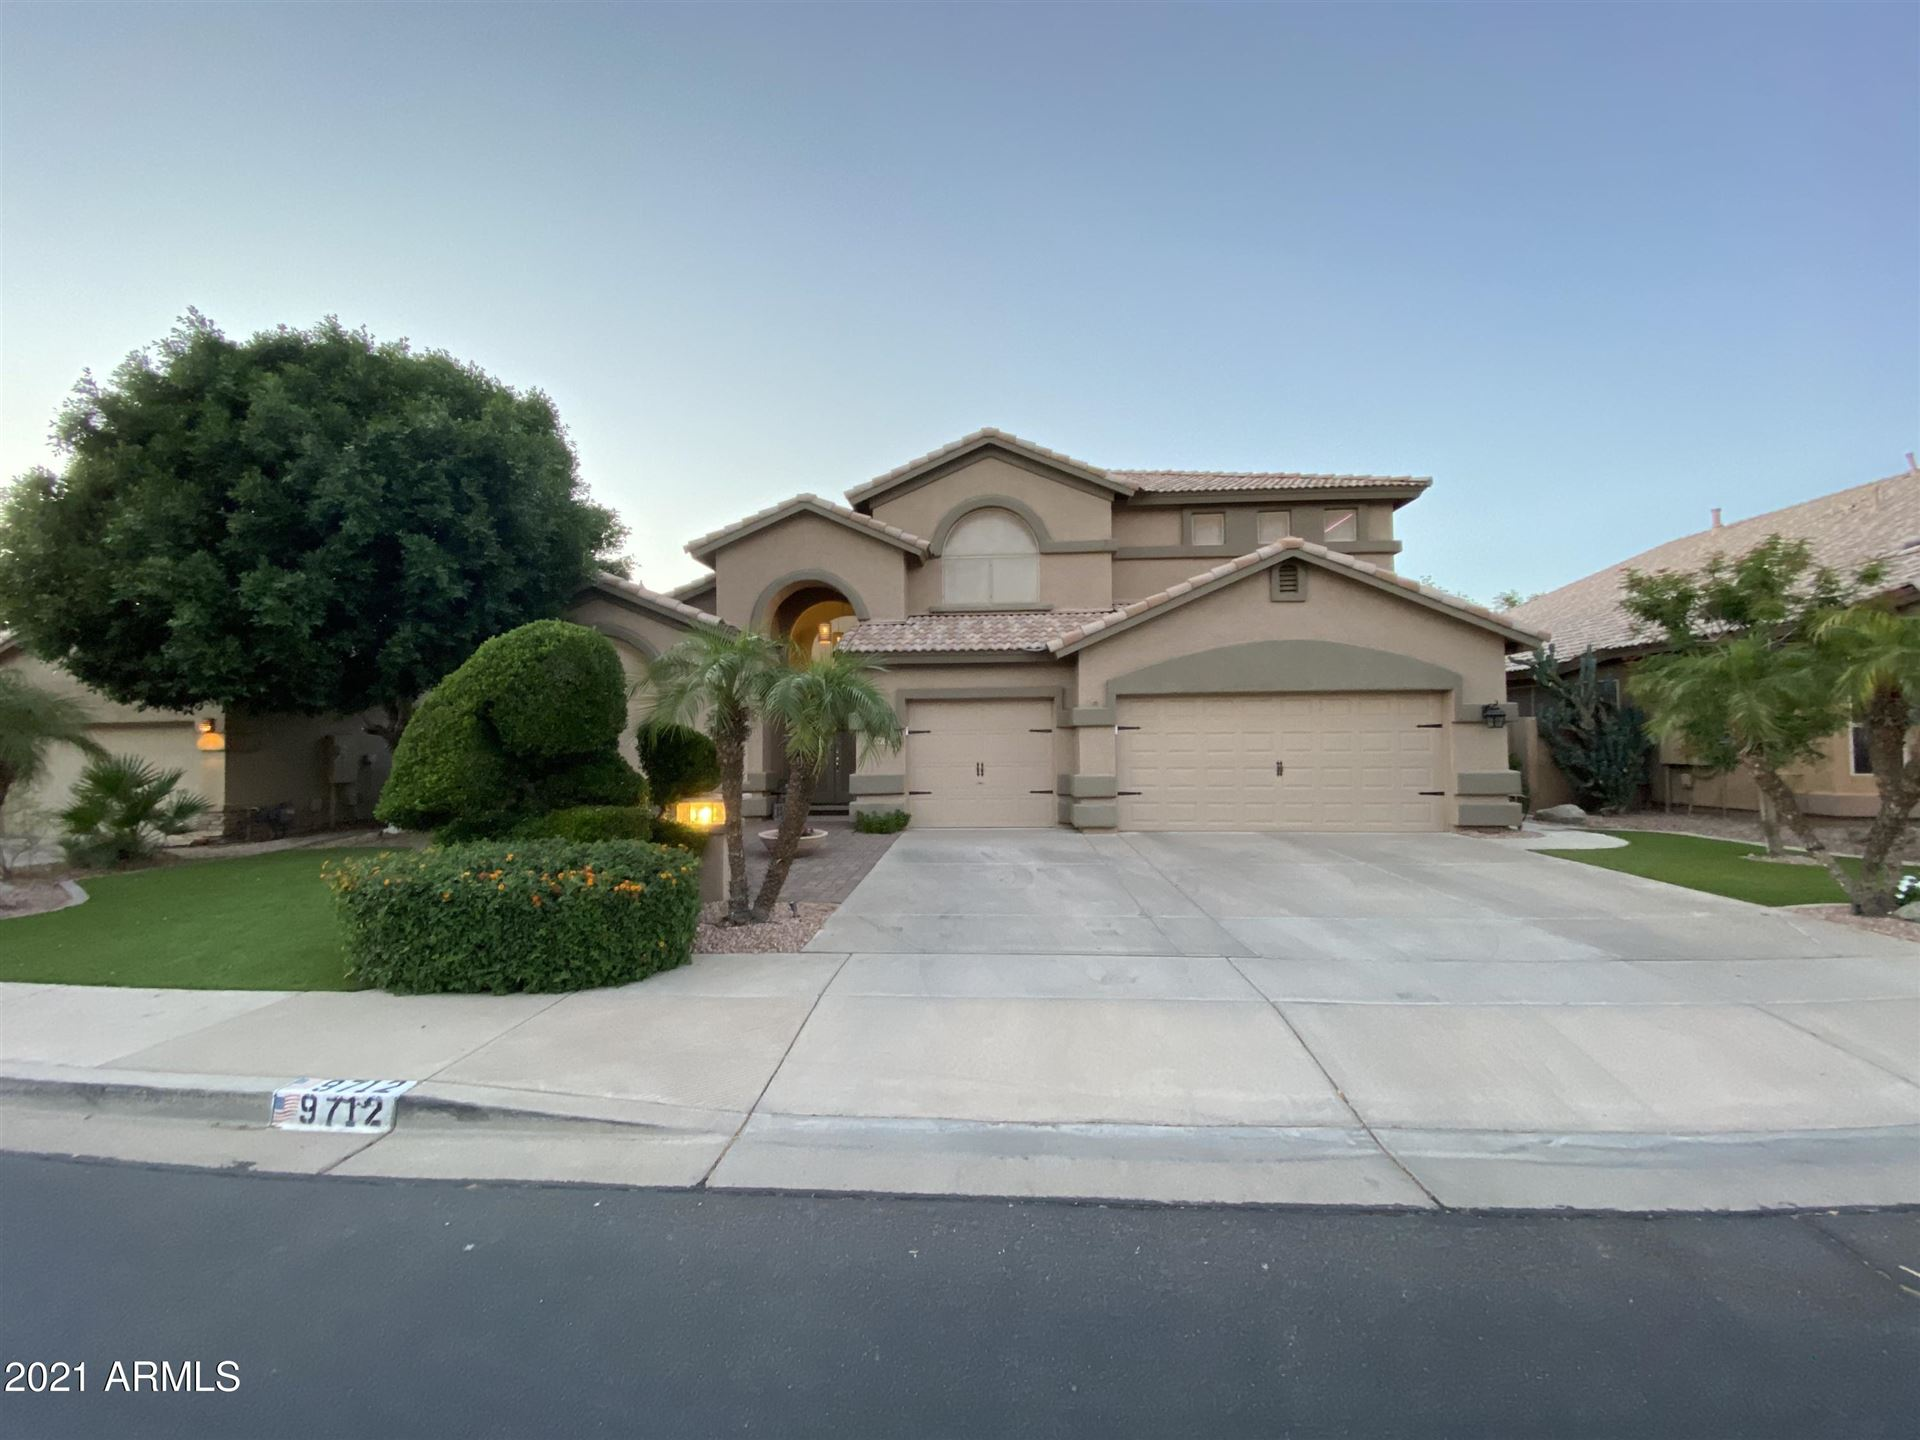 9712 E NAVARRO Avenue, Mesa, AZ 85209 - MLS#: 6232453